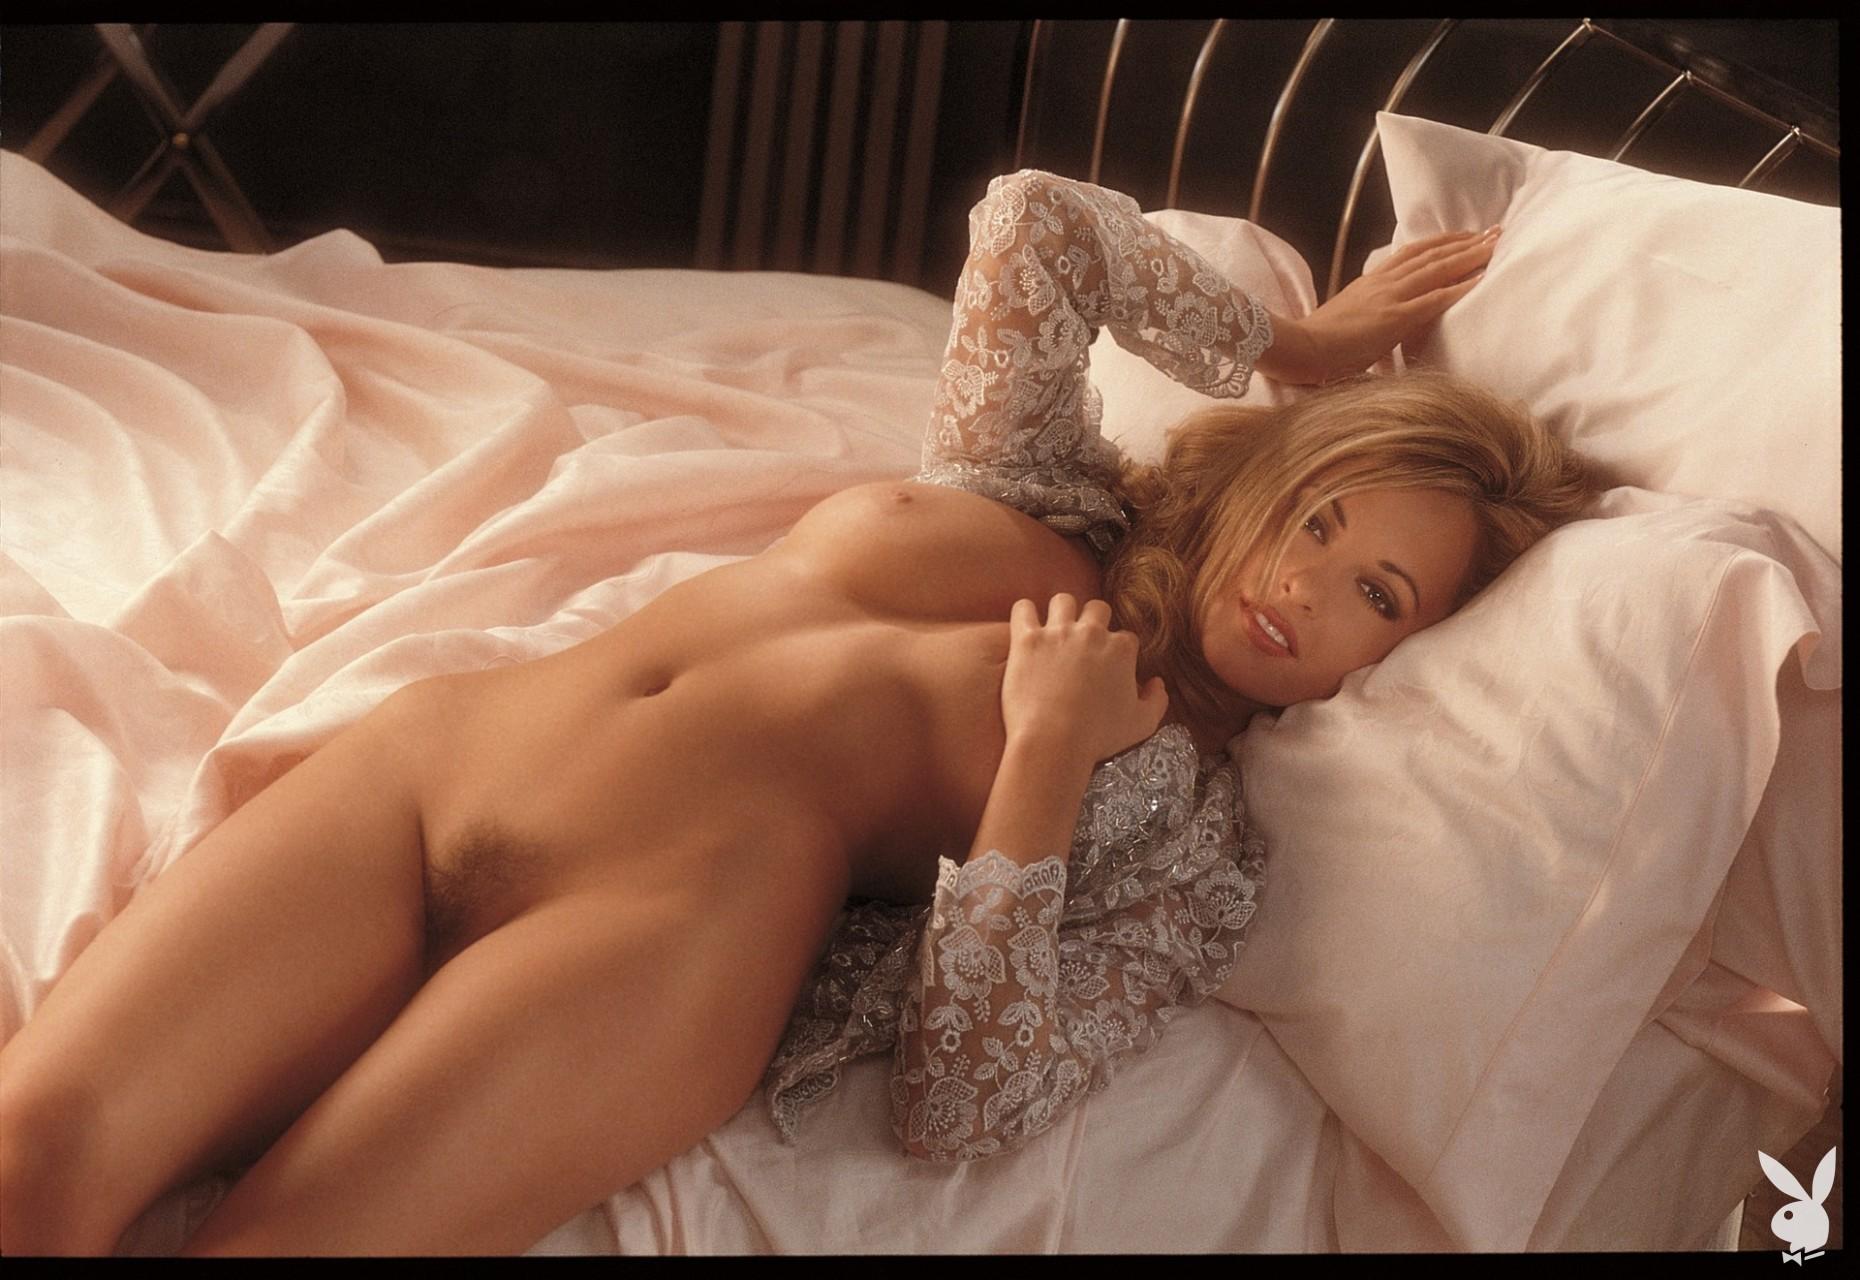 Playmate June 1995 Rhonda Adams Playboy Plus (11)